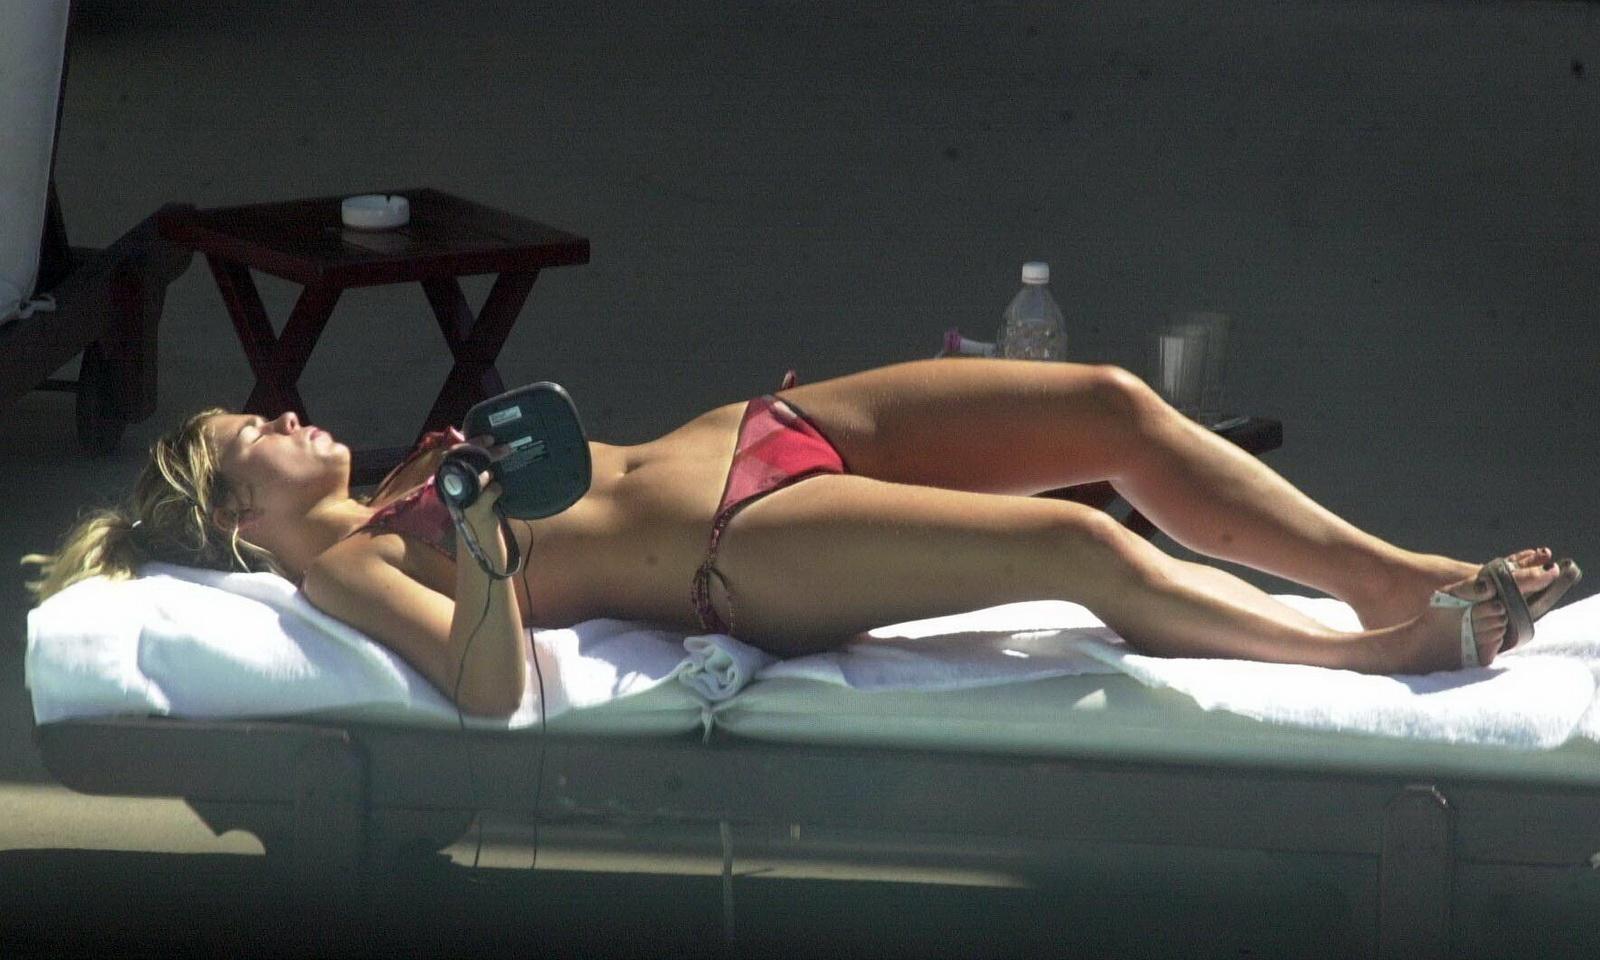 Billie Piper hot young bikini ass crack candids ~ top famous actress